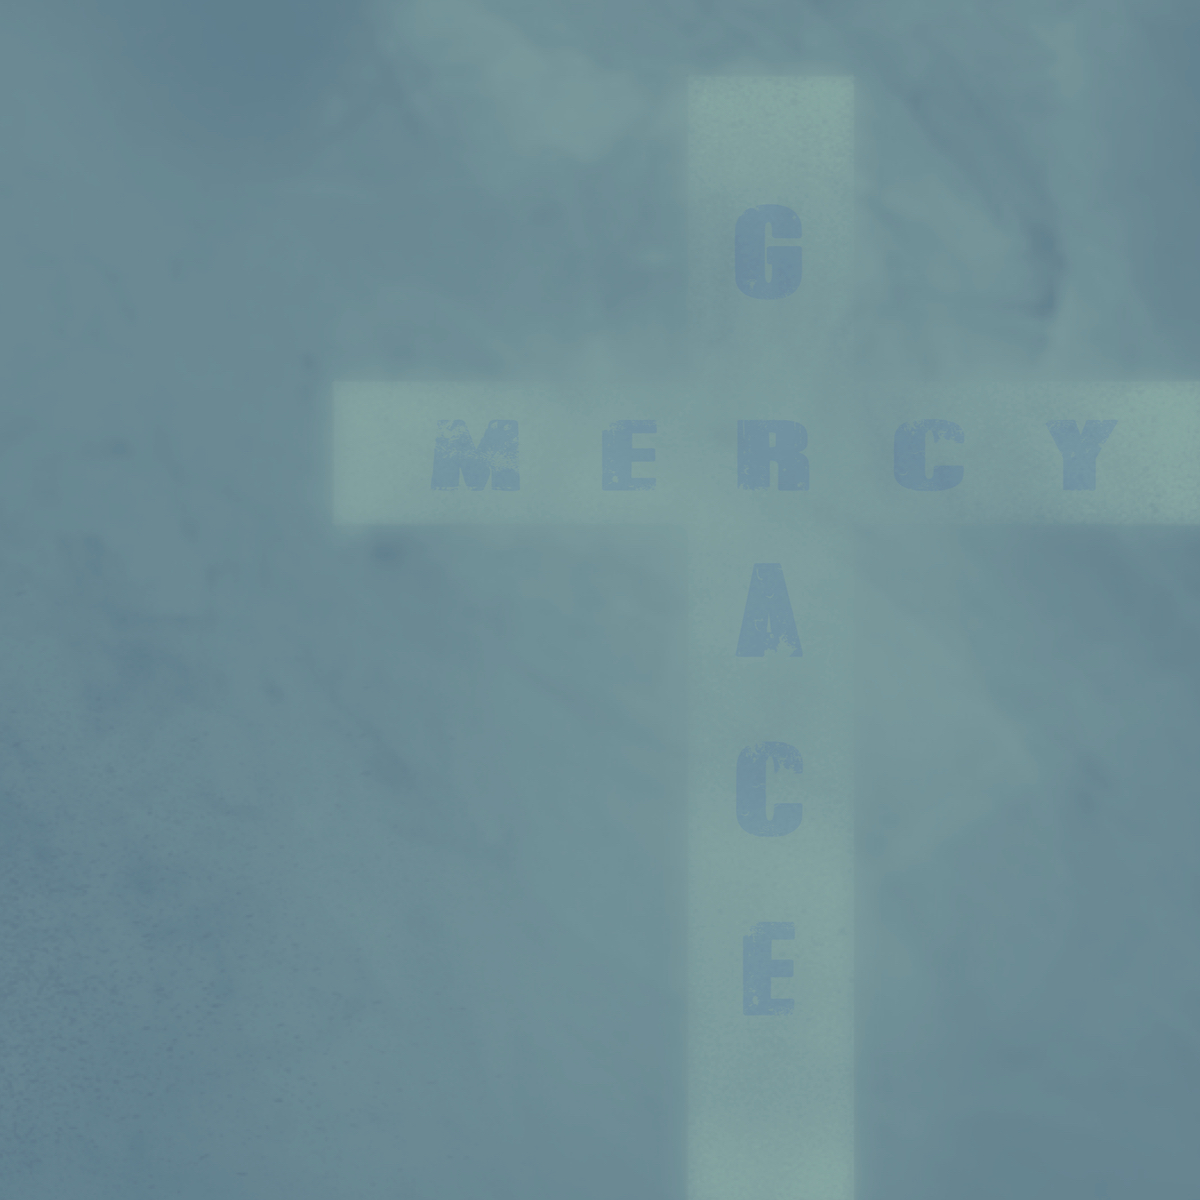 mercygracesocial.jpg